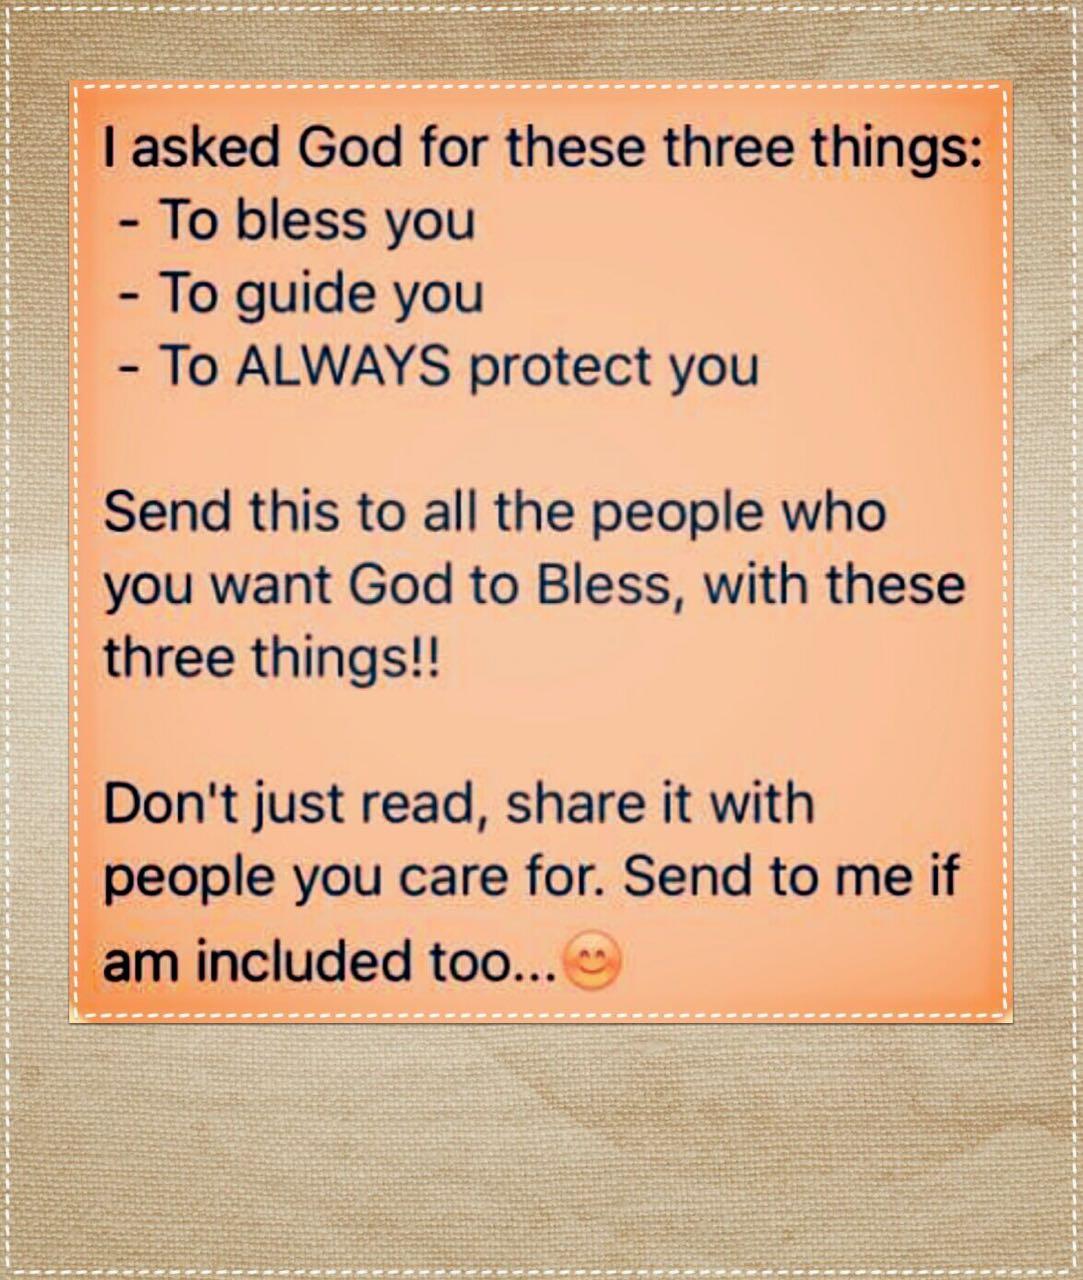 I_asked_God_three_things.jpg